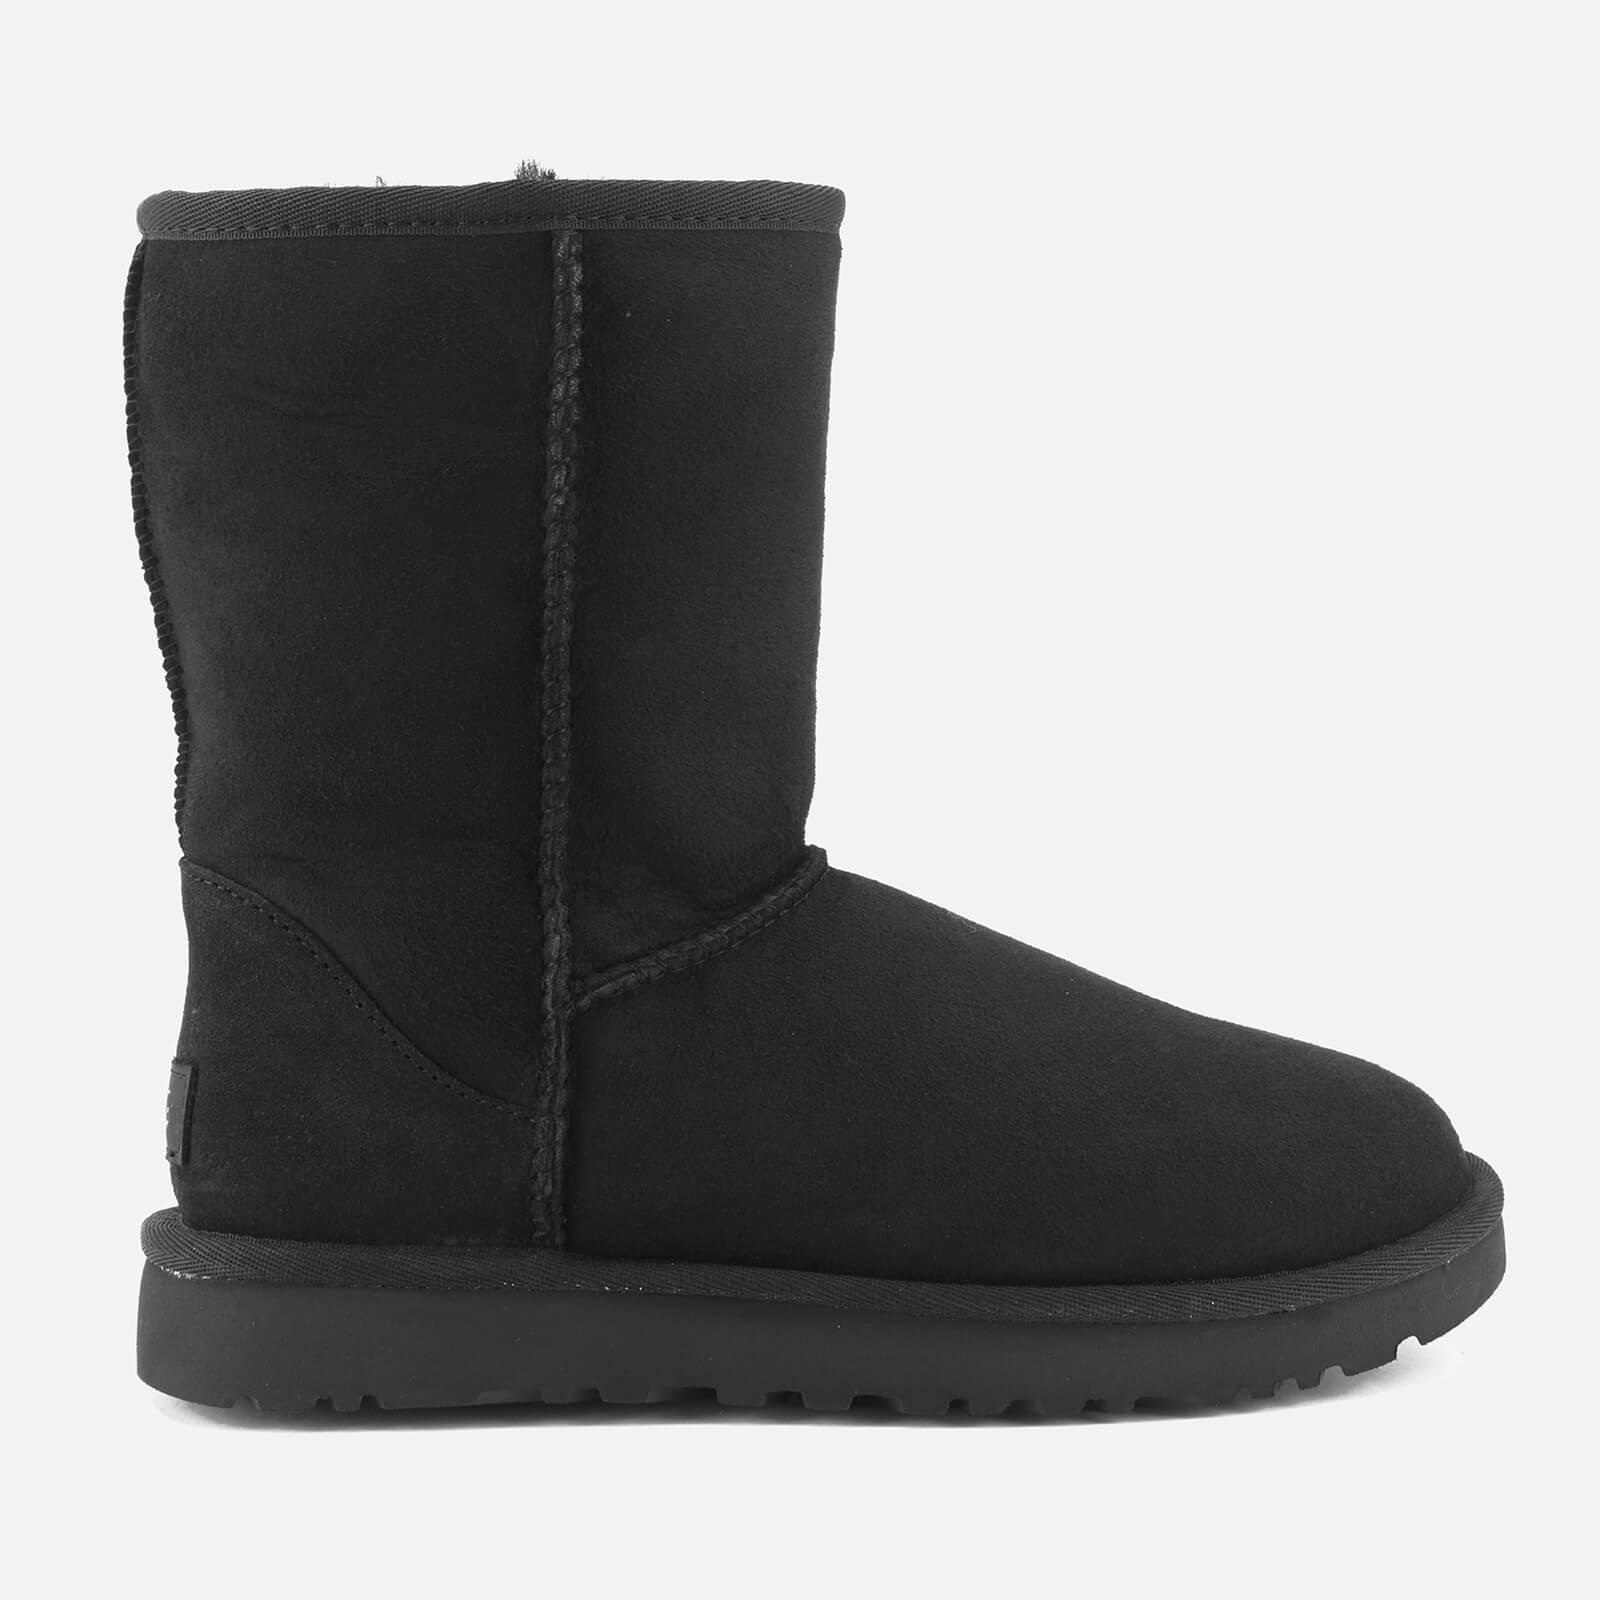 UGG Women's Classic Short II Sheepskin Boots - Black - UK 3